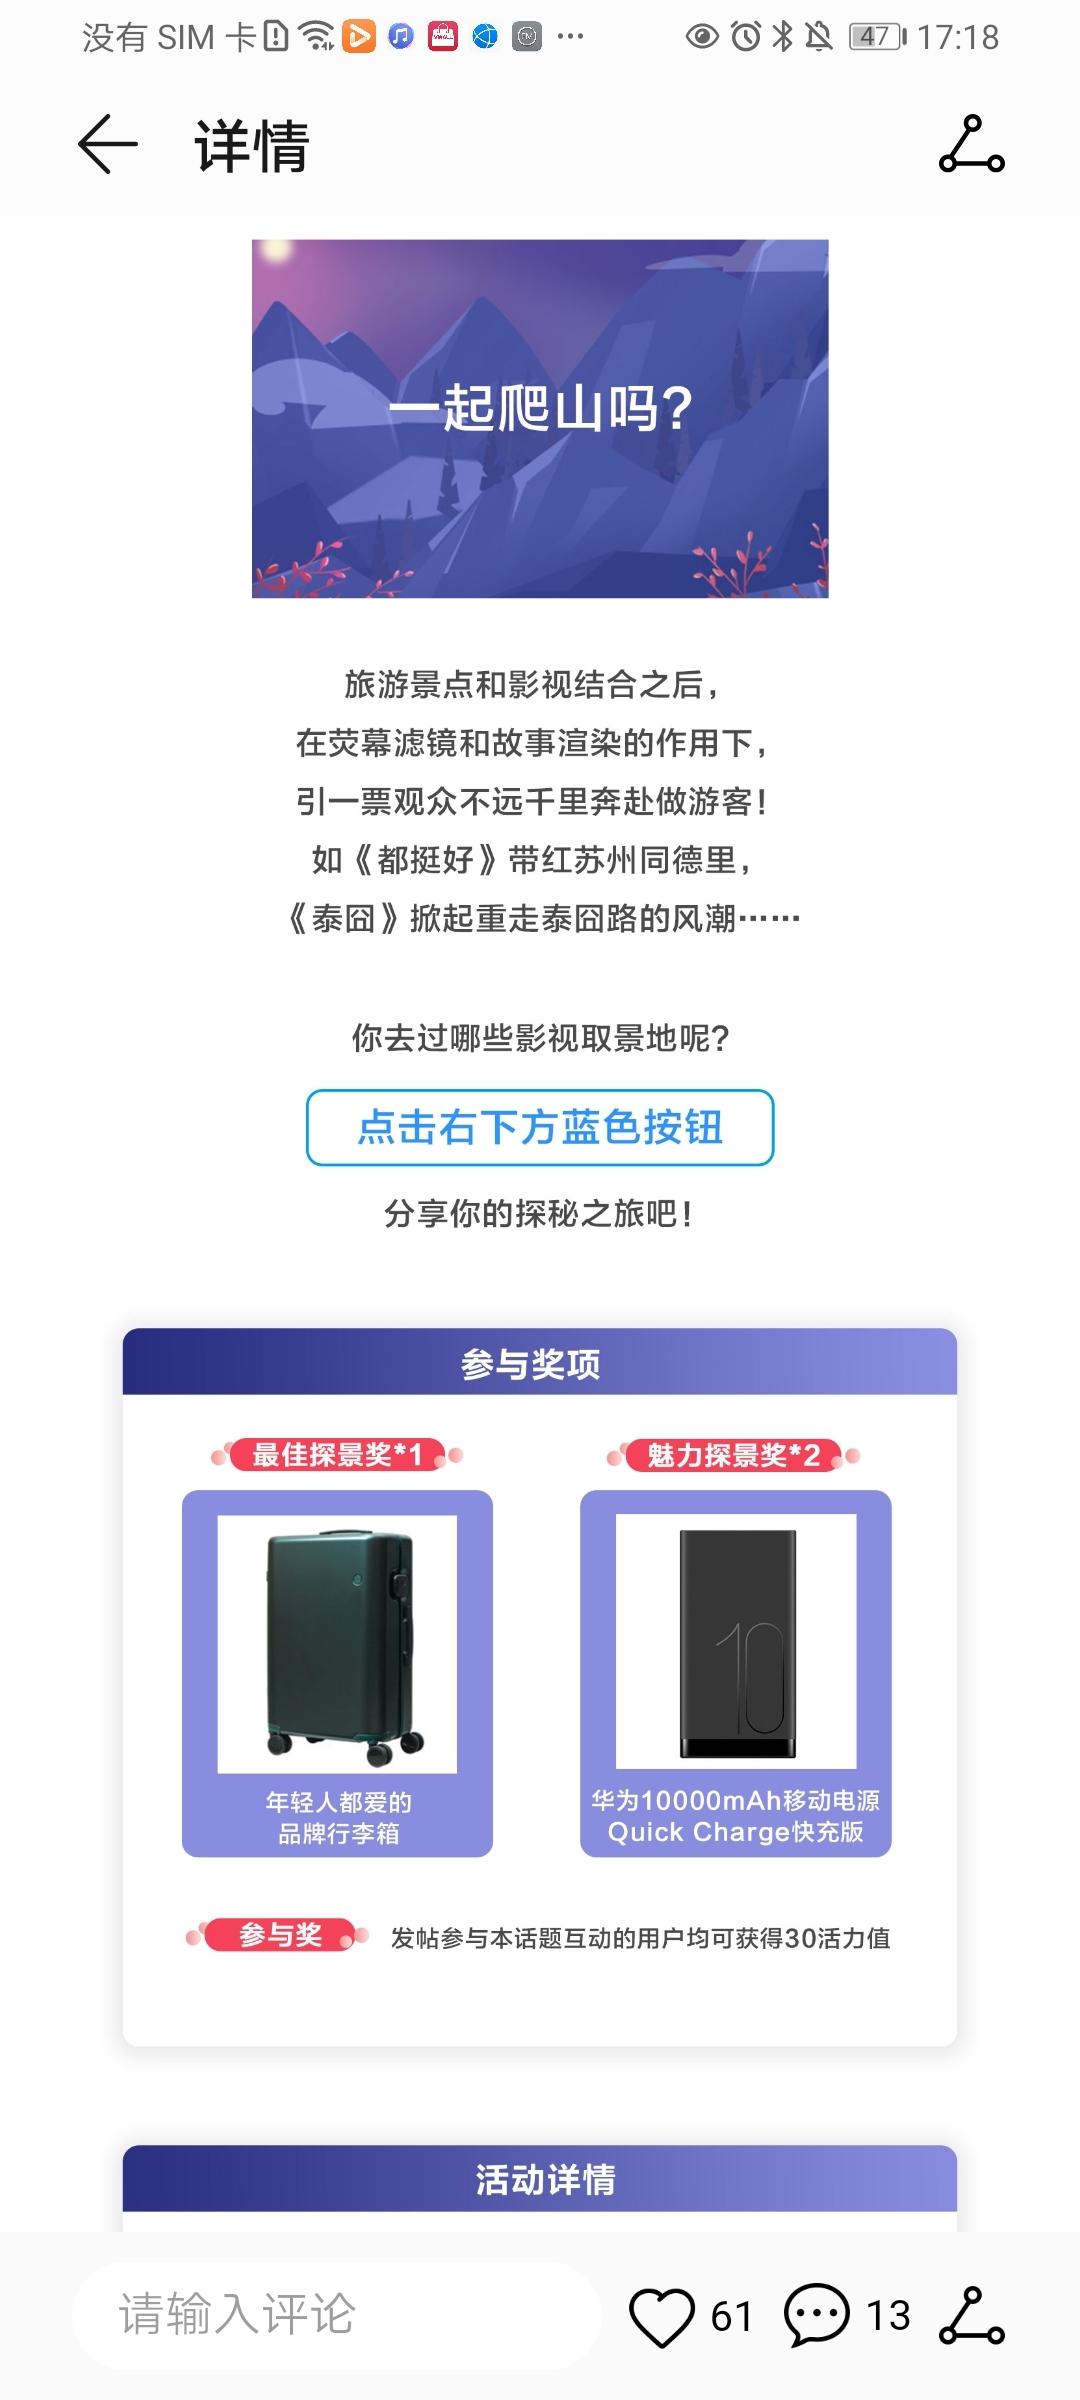 Screenshot_20200819_171828_com.huawei.mycenter.jpg